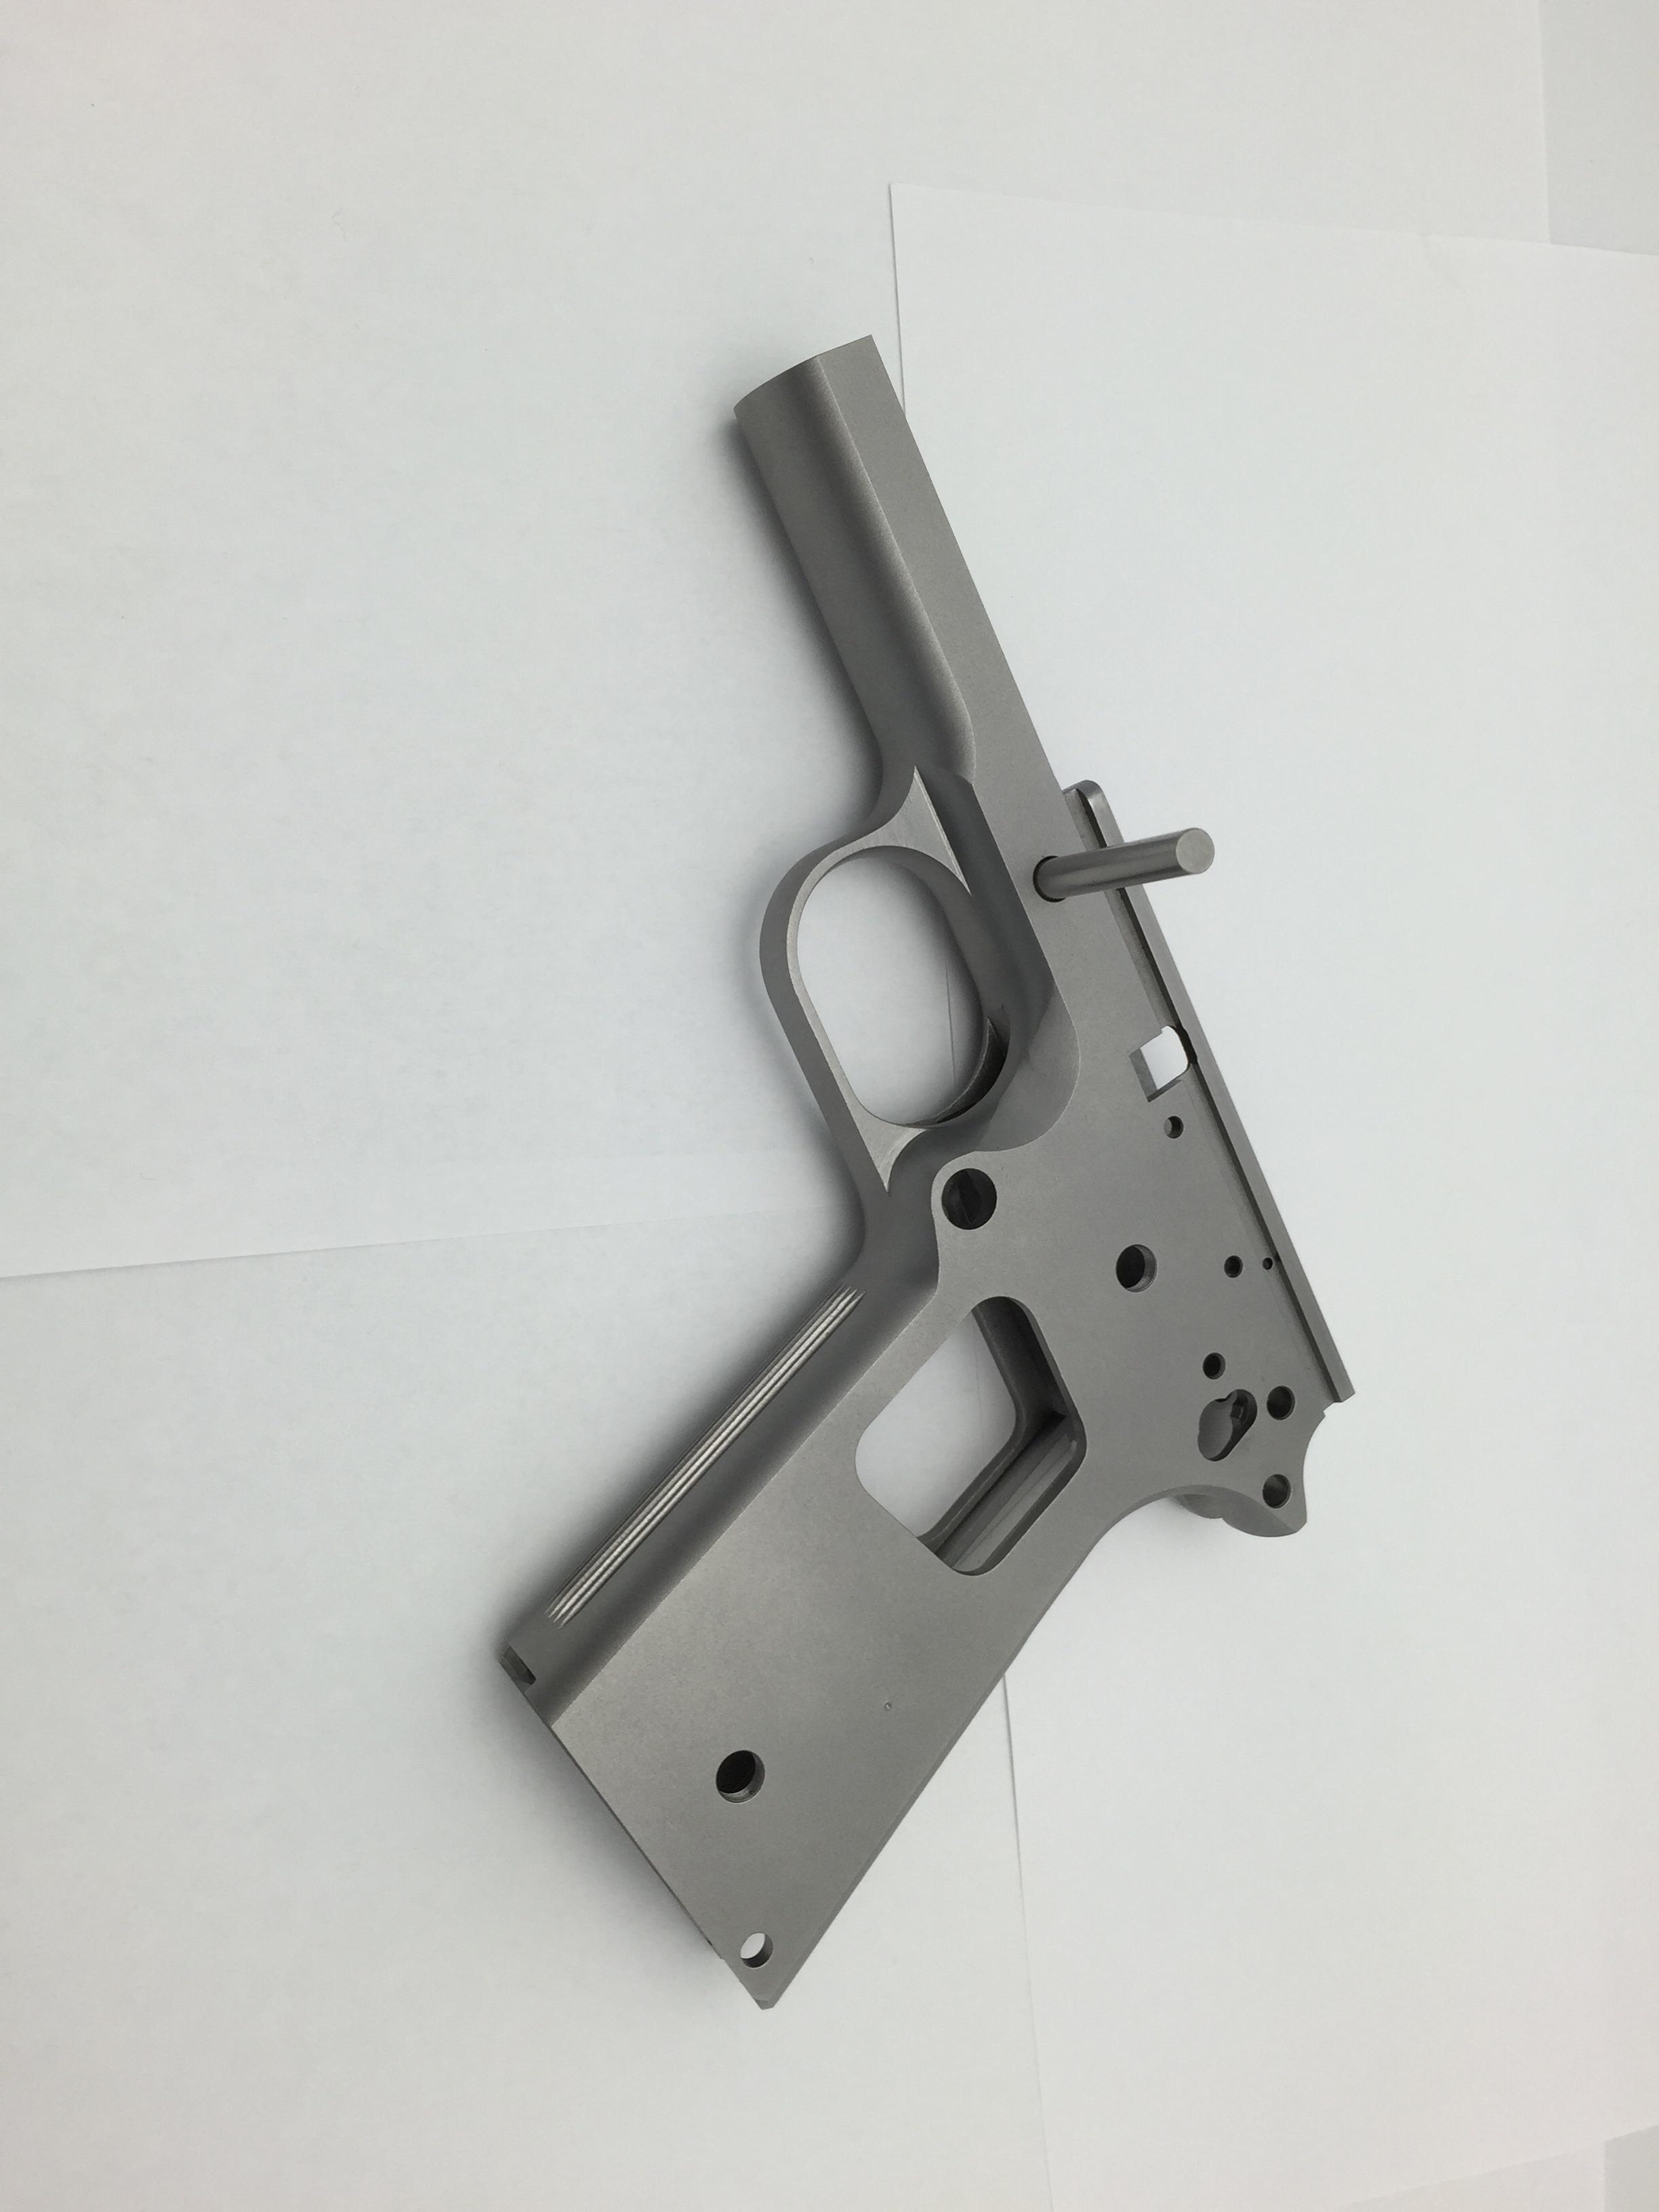 Colt / Caspian fitment issue - 1911Forum